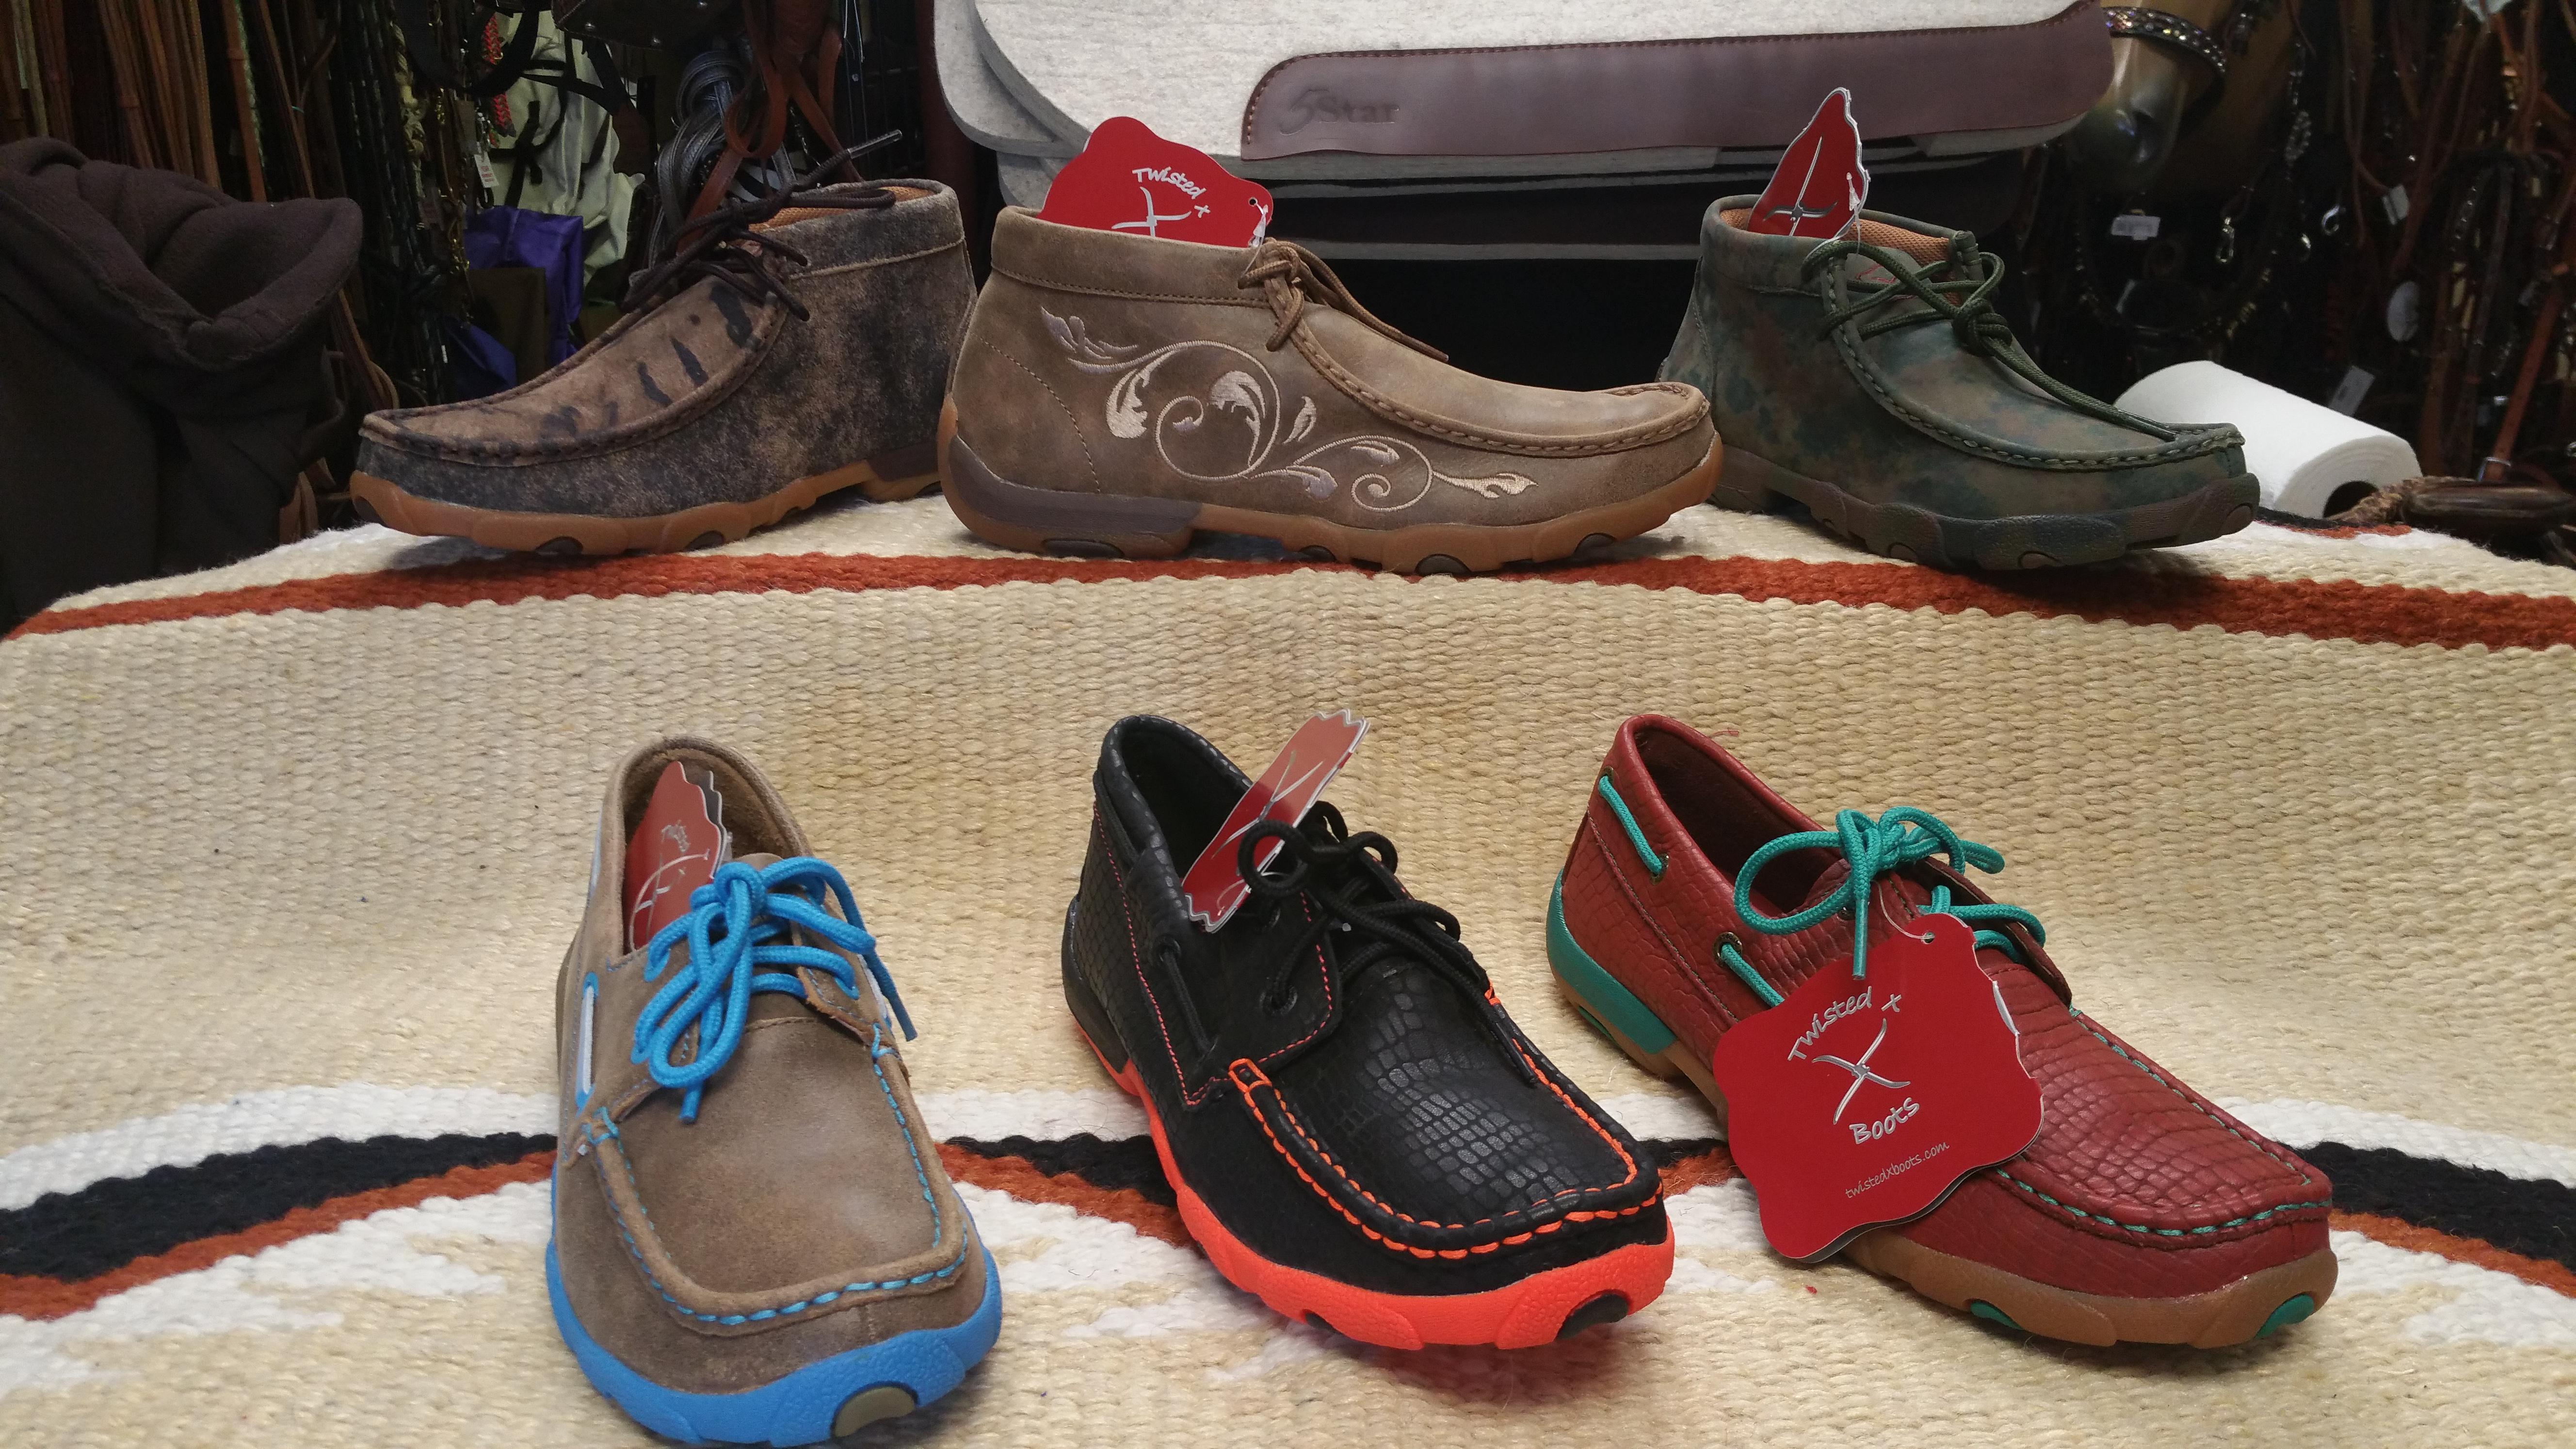 Cowboy Amp Work Boots Casper Wy Moss Saddles Boot Amp Tack